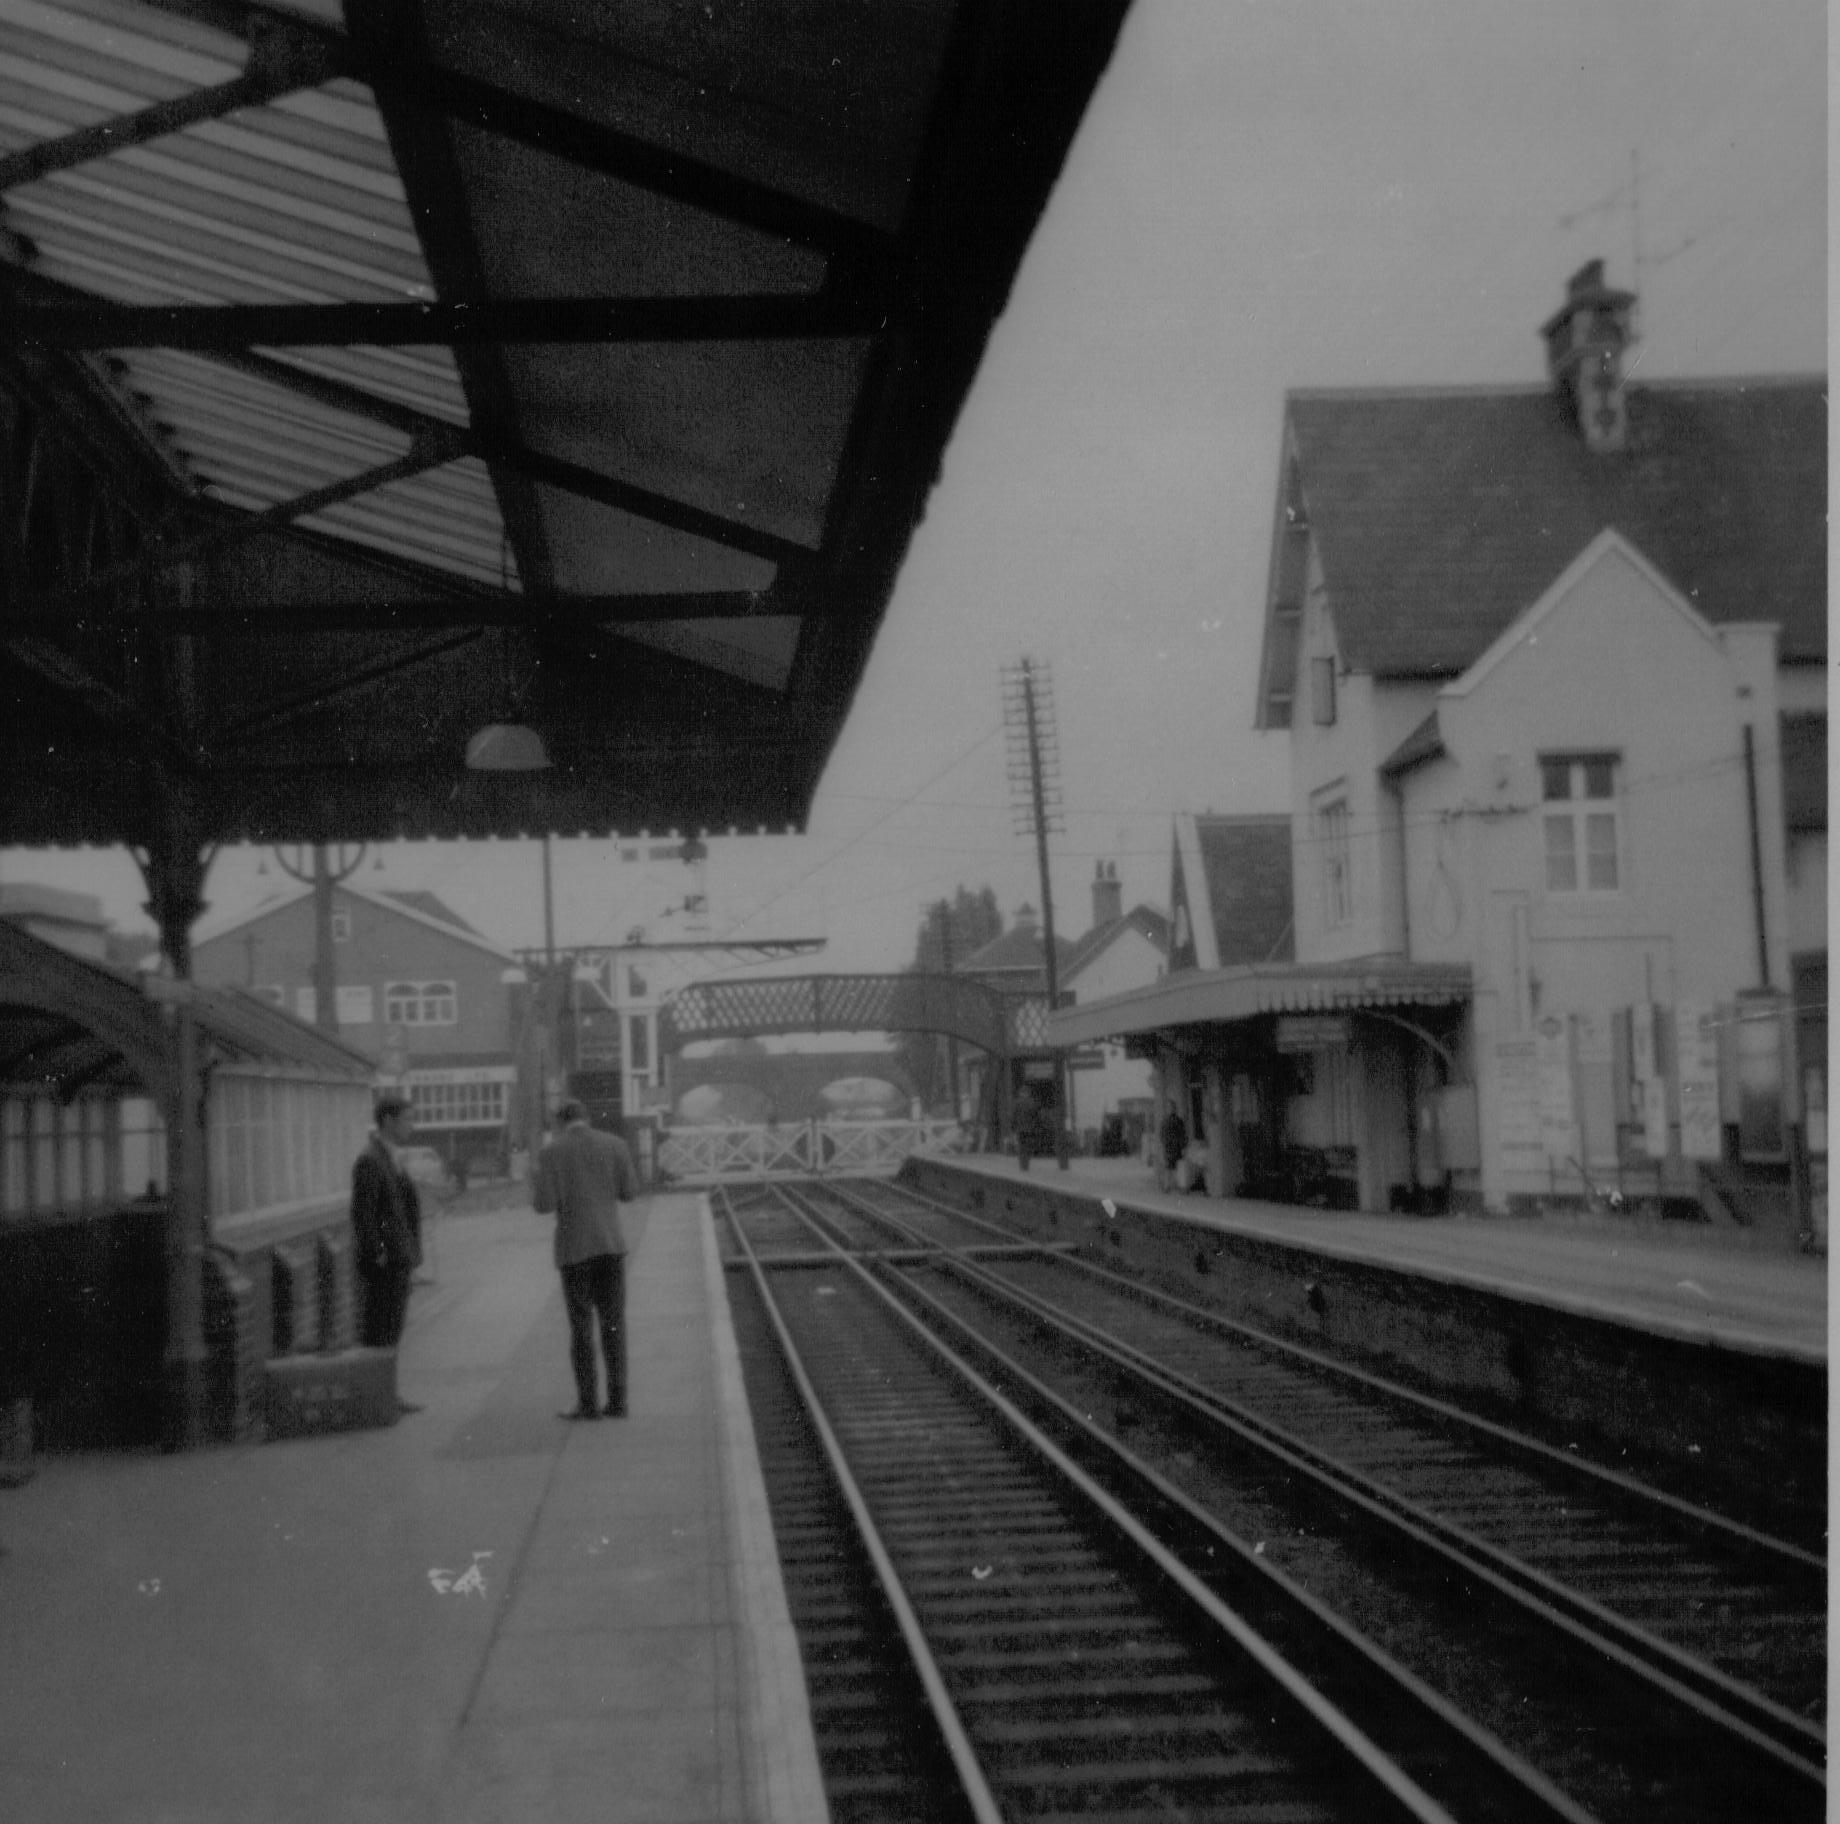 England Railway Station Railway Station England